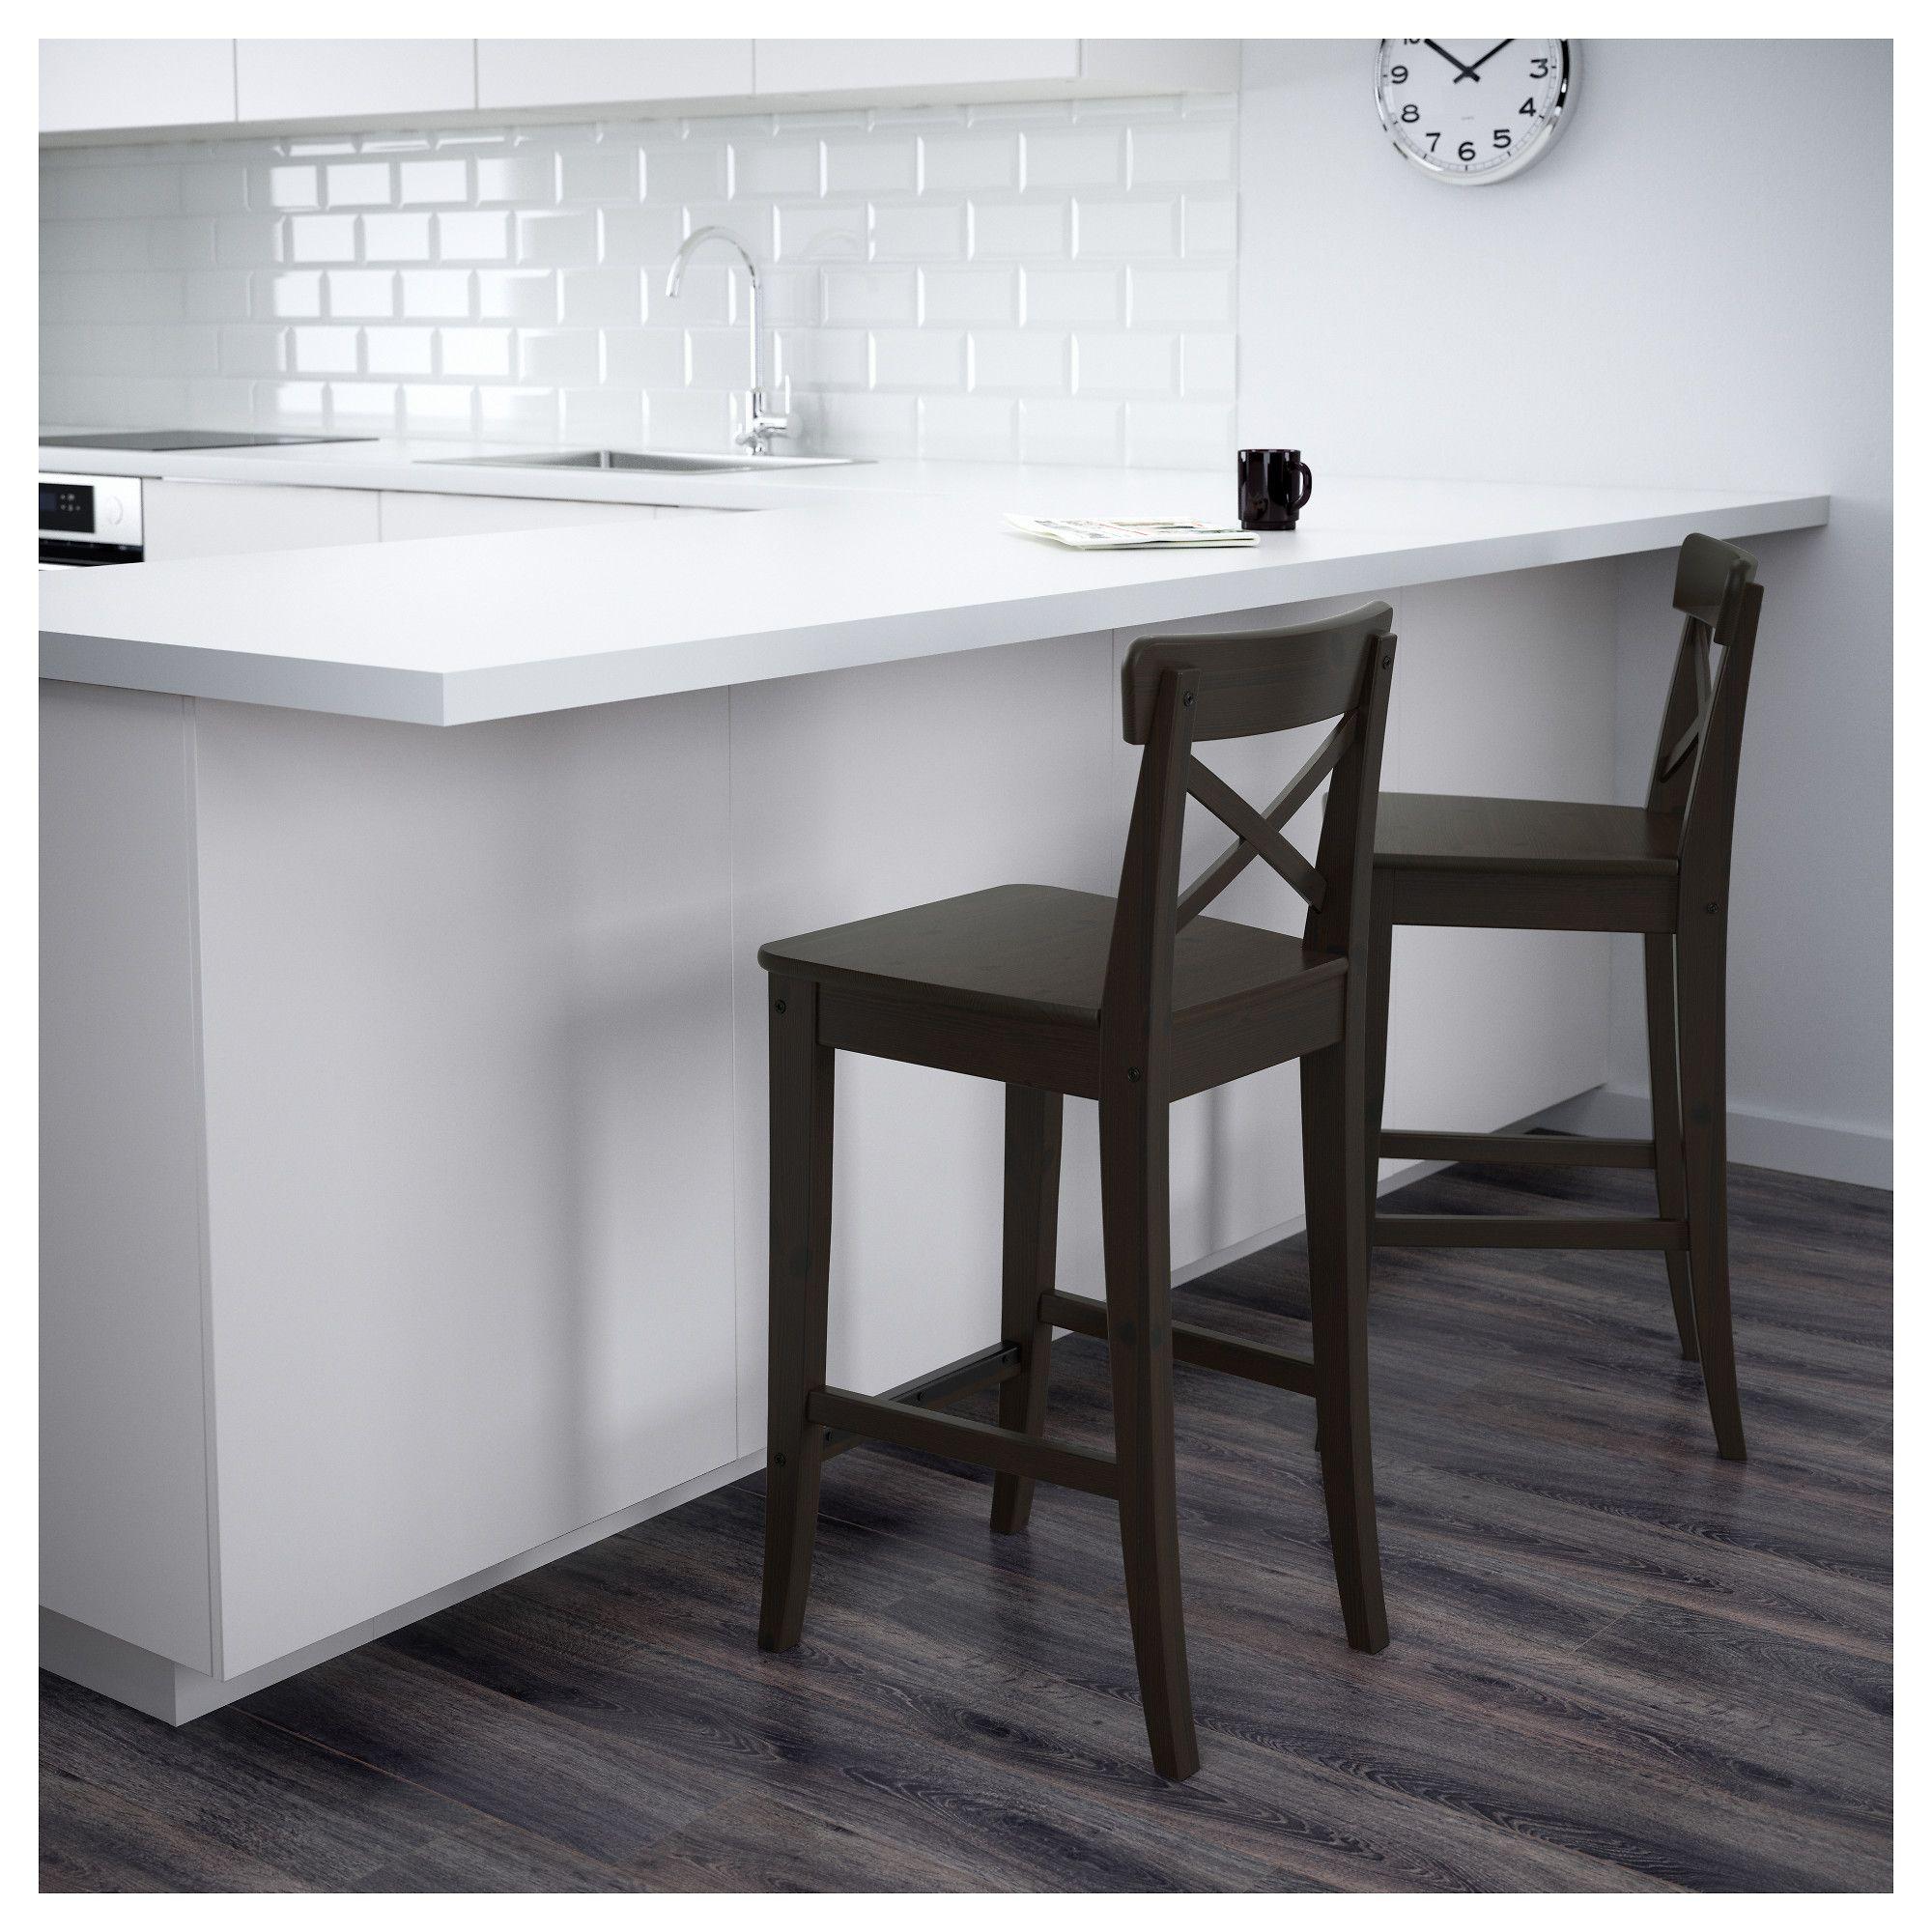 Ingolf Bar Stool With Backrest Brown Black 63 Cm Bar Stools Home Decor Kitchen Ikea Barstools